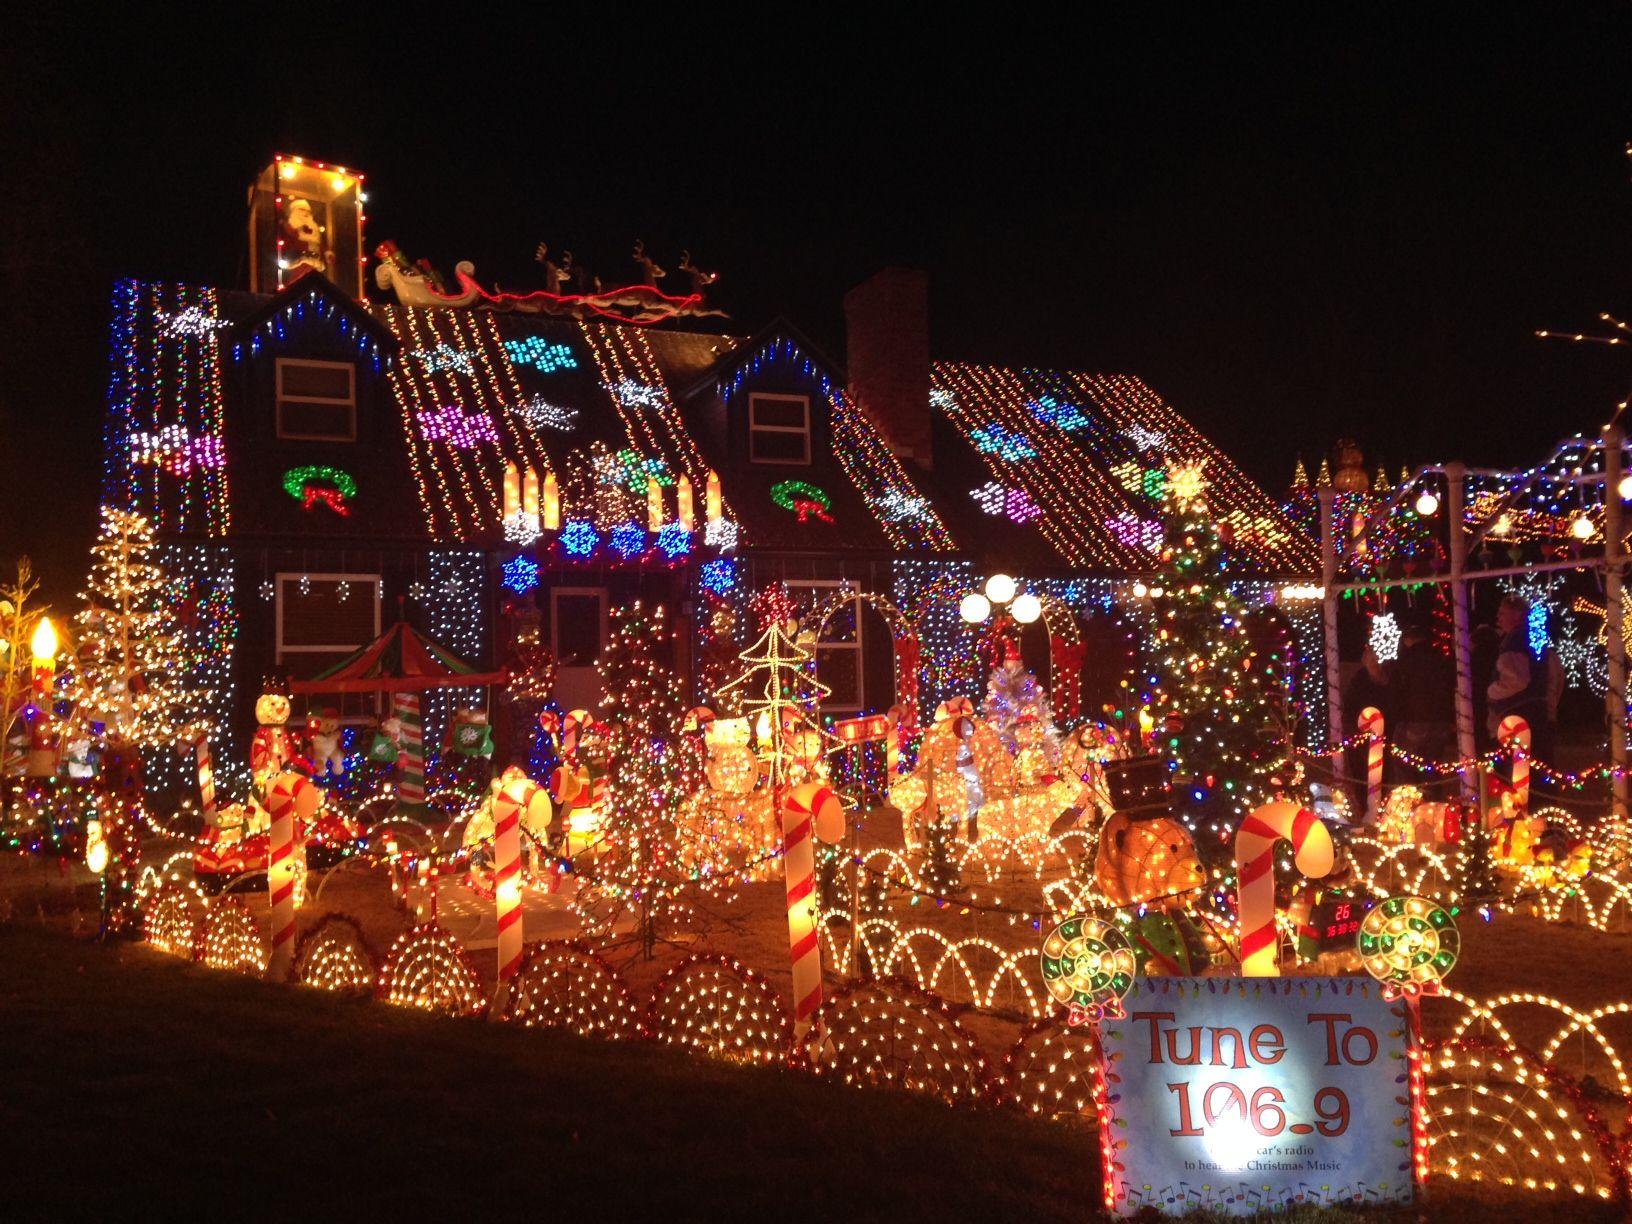 Christmas Lights In Wichita Ks.Spectacular Light Display In Wichita Local News Home